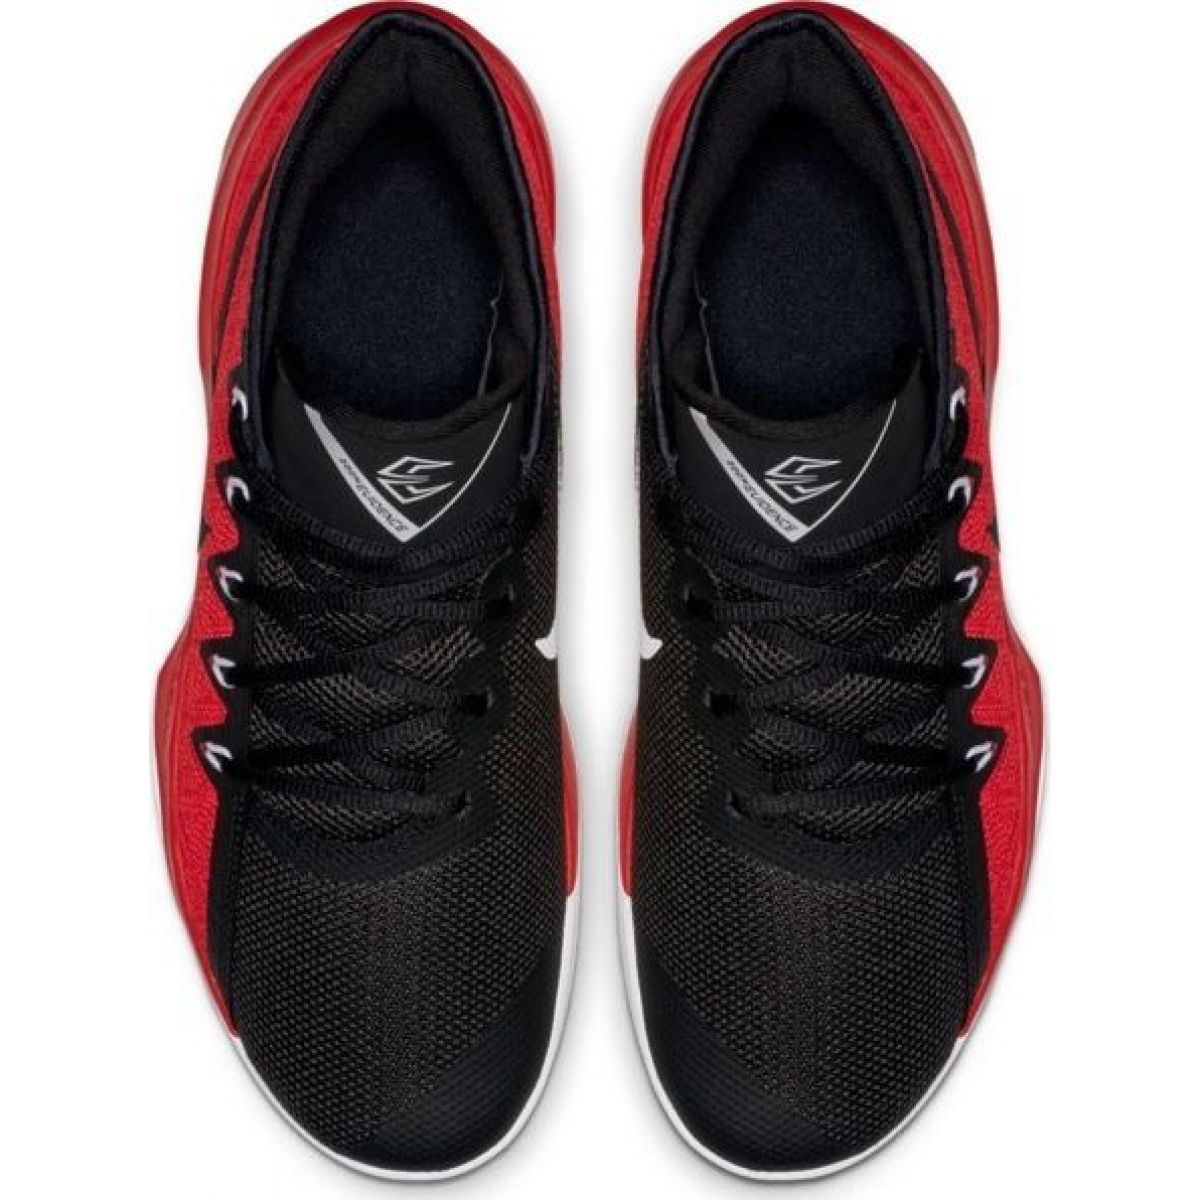 Mova Se Nike Air Max 270 vermelho e preto é na Mova se